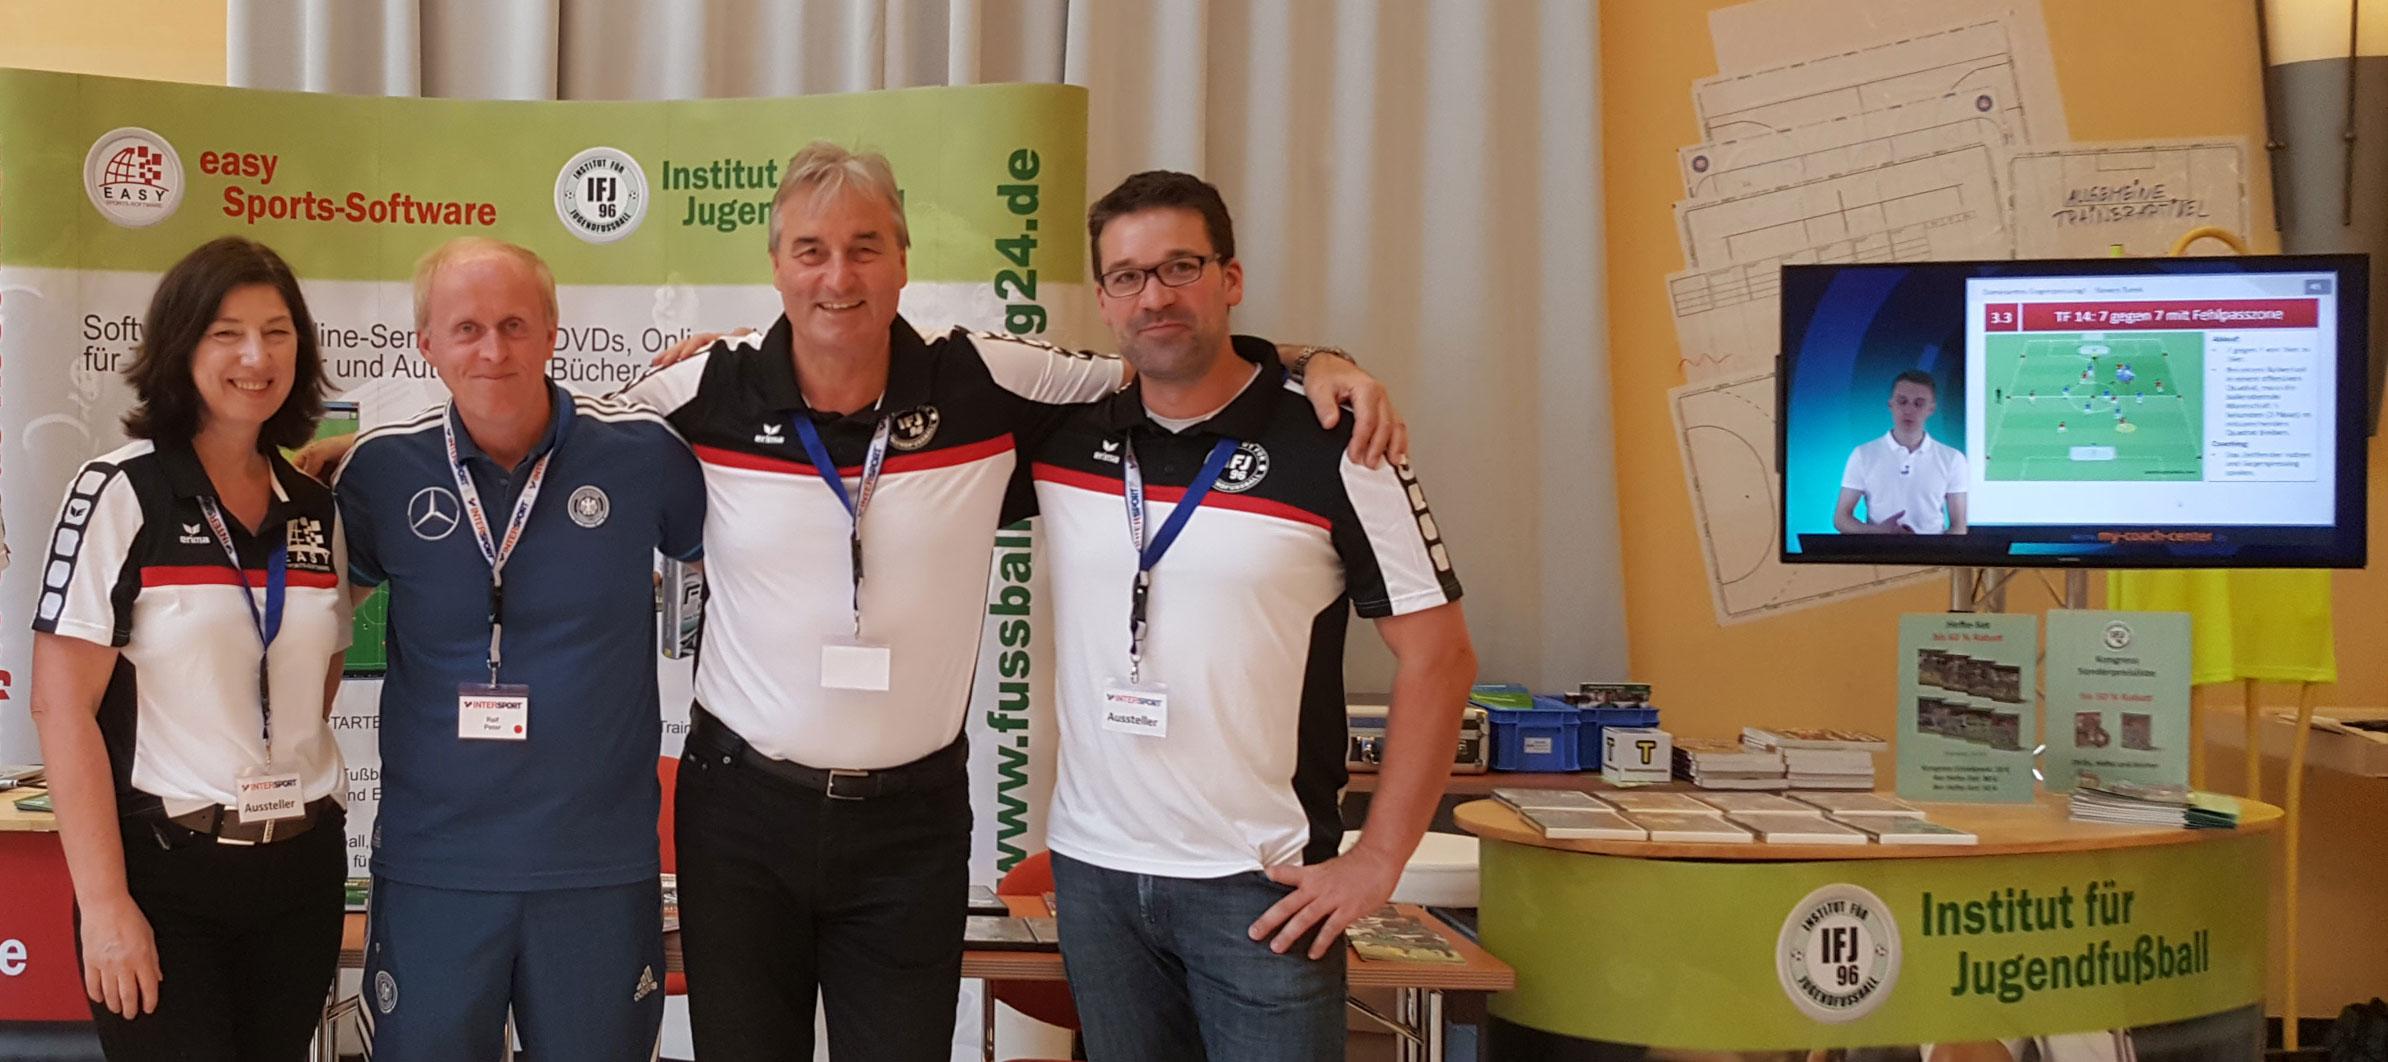 Ralf Peter am Stand Institut für Jugendfußball/easy Sports-Software